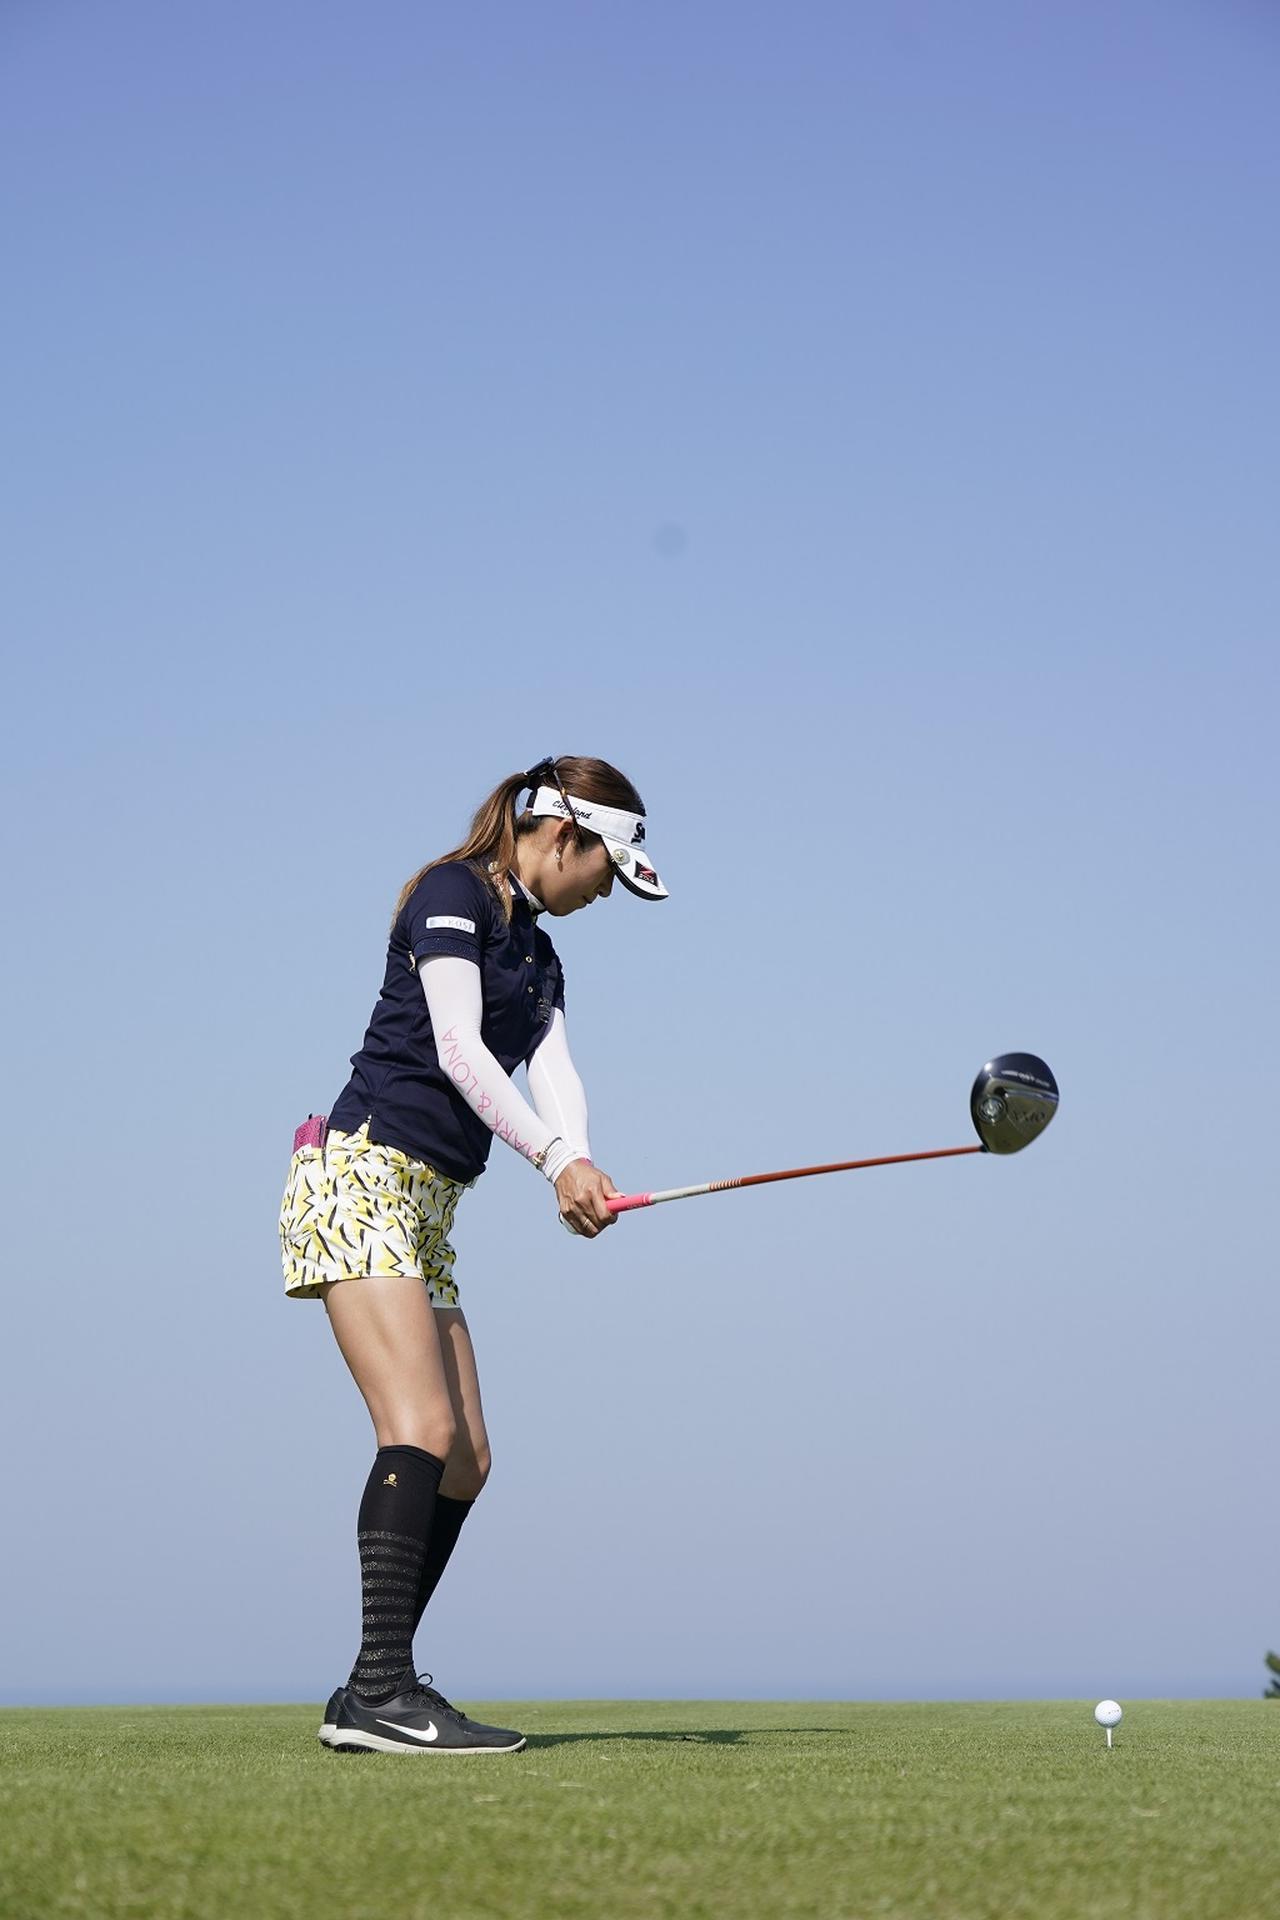 Images : 2番目の画像 - 金田久美子ドライバー後方連続写真 - みんなのゴルフダイジェスト